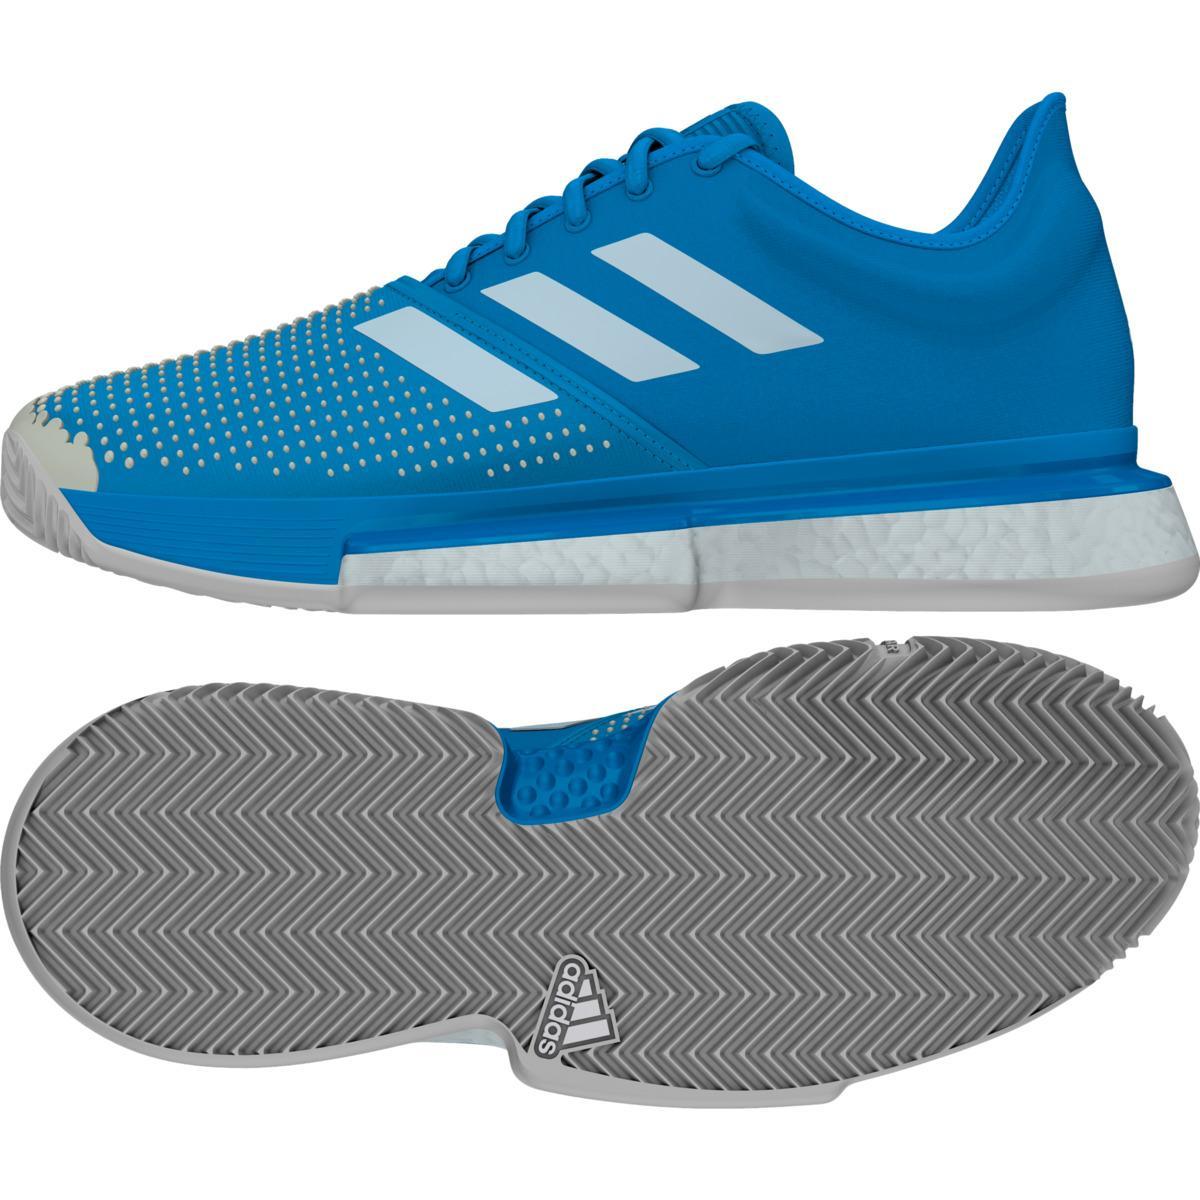 e0bd38884 Adidas - Blue Solecourt Boost Clay Tennis padel Tennis Shoes for Men -  Lyst. View fullscreen